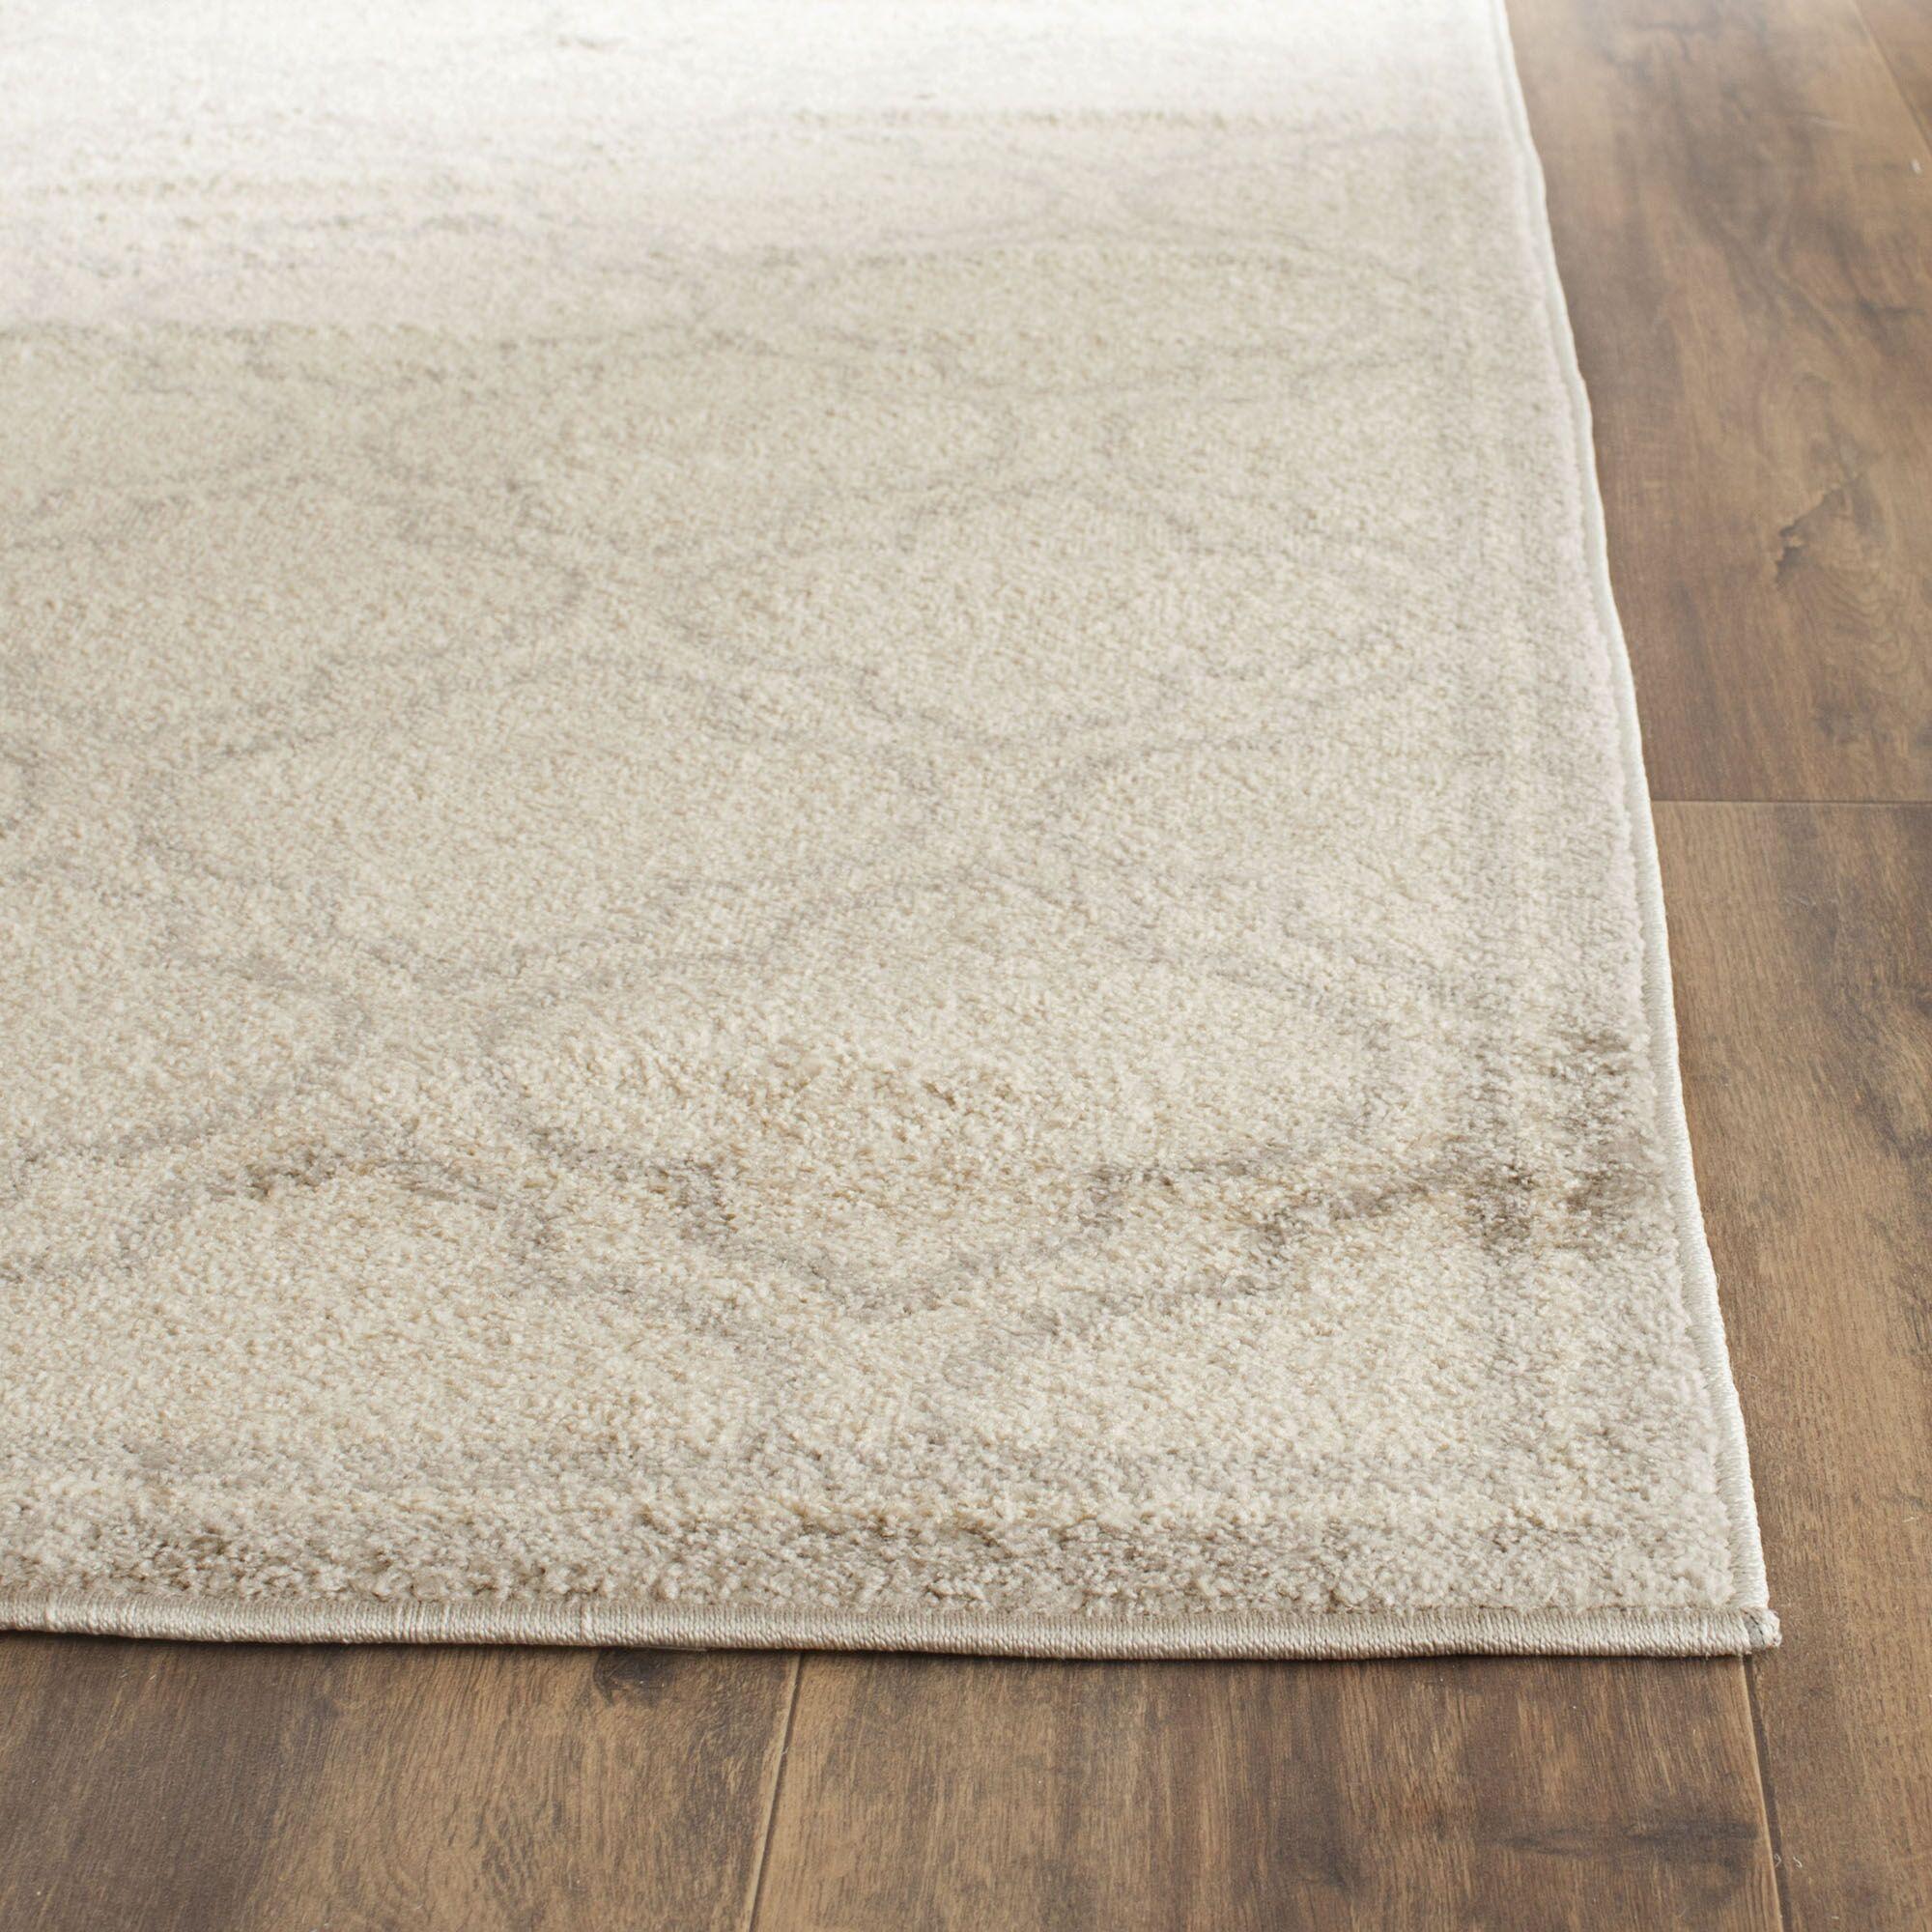 Maritza Geometric Ivory/Light Gray Indoor/Outdoor Area Rug Rug Size: Rectangle 5' x 8'